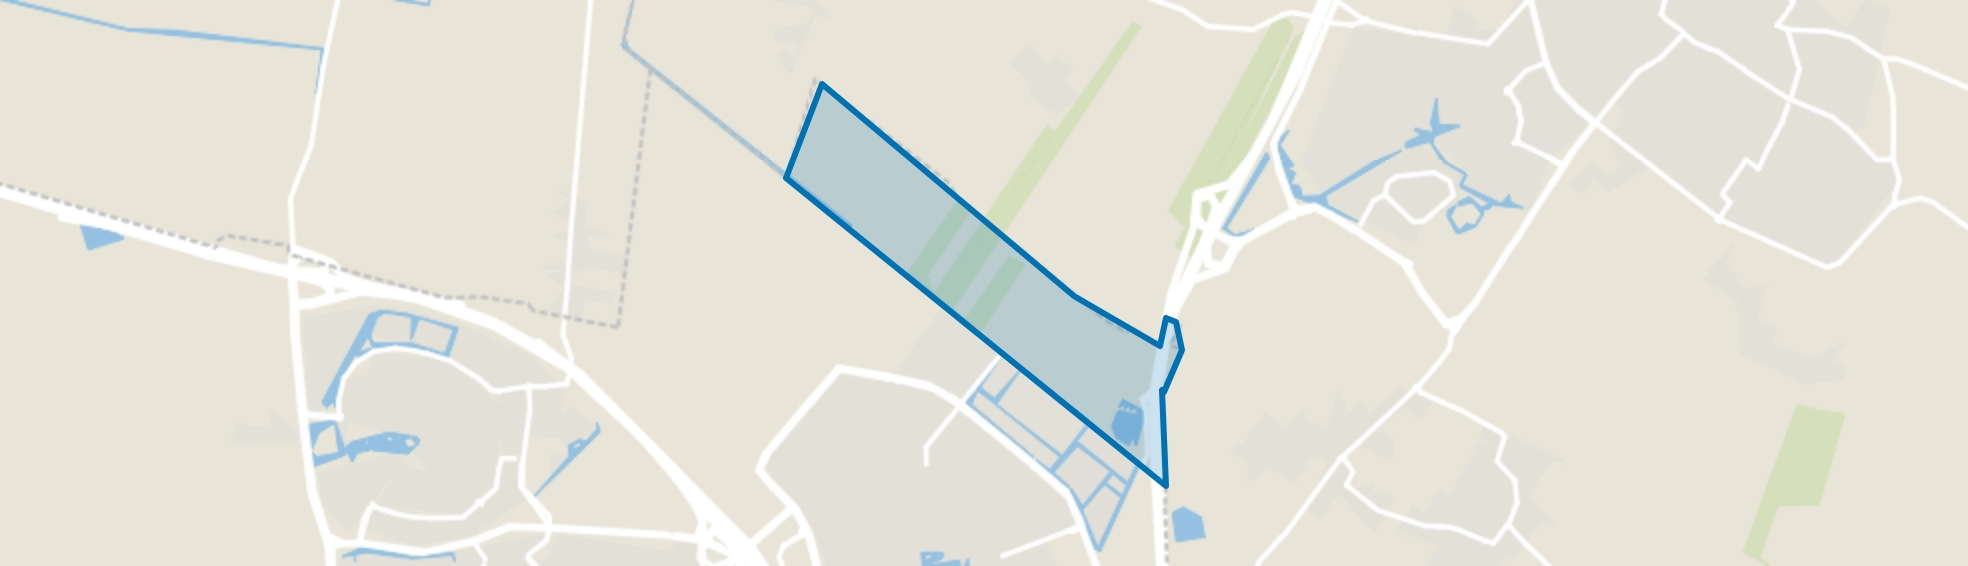 Vathorst-Noord, Amersfoort map